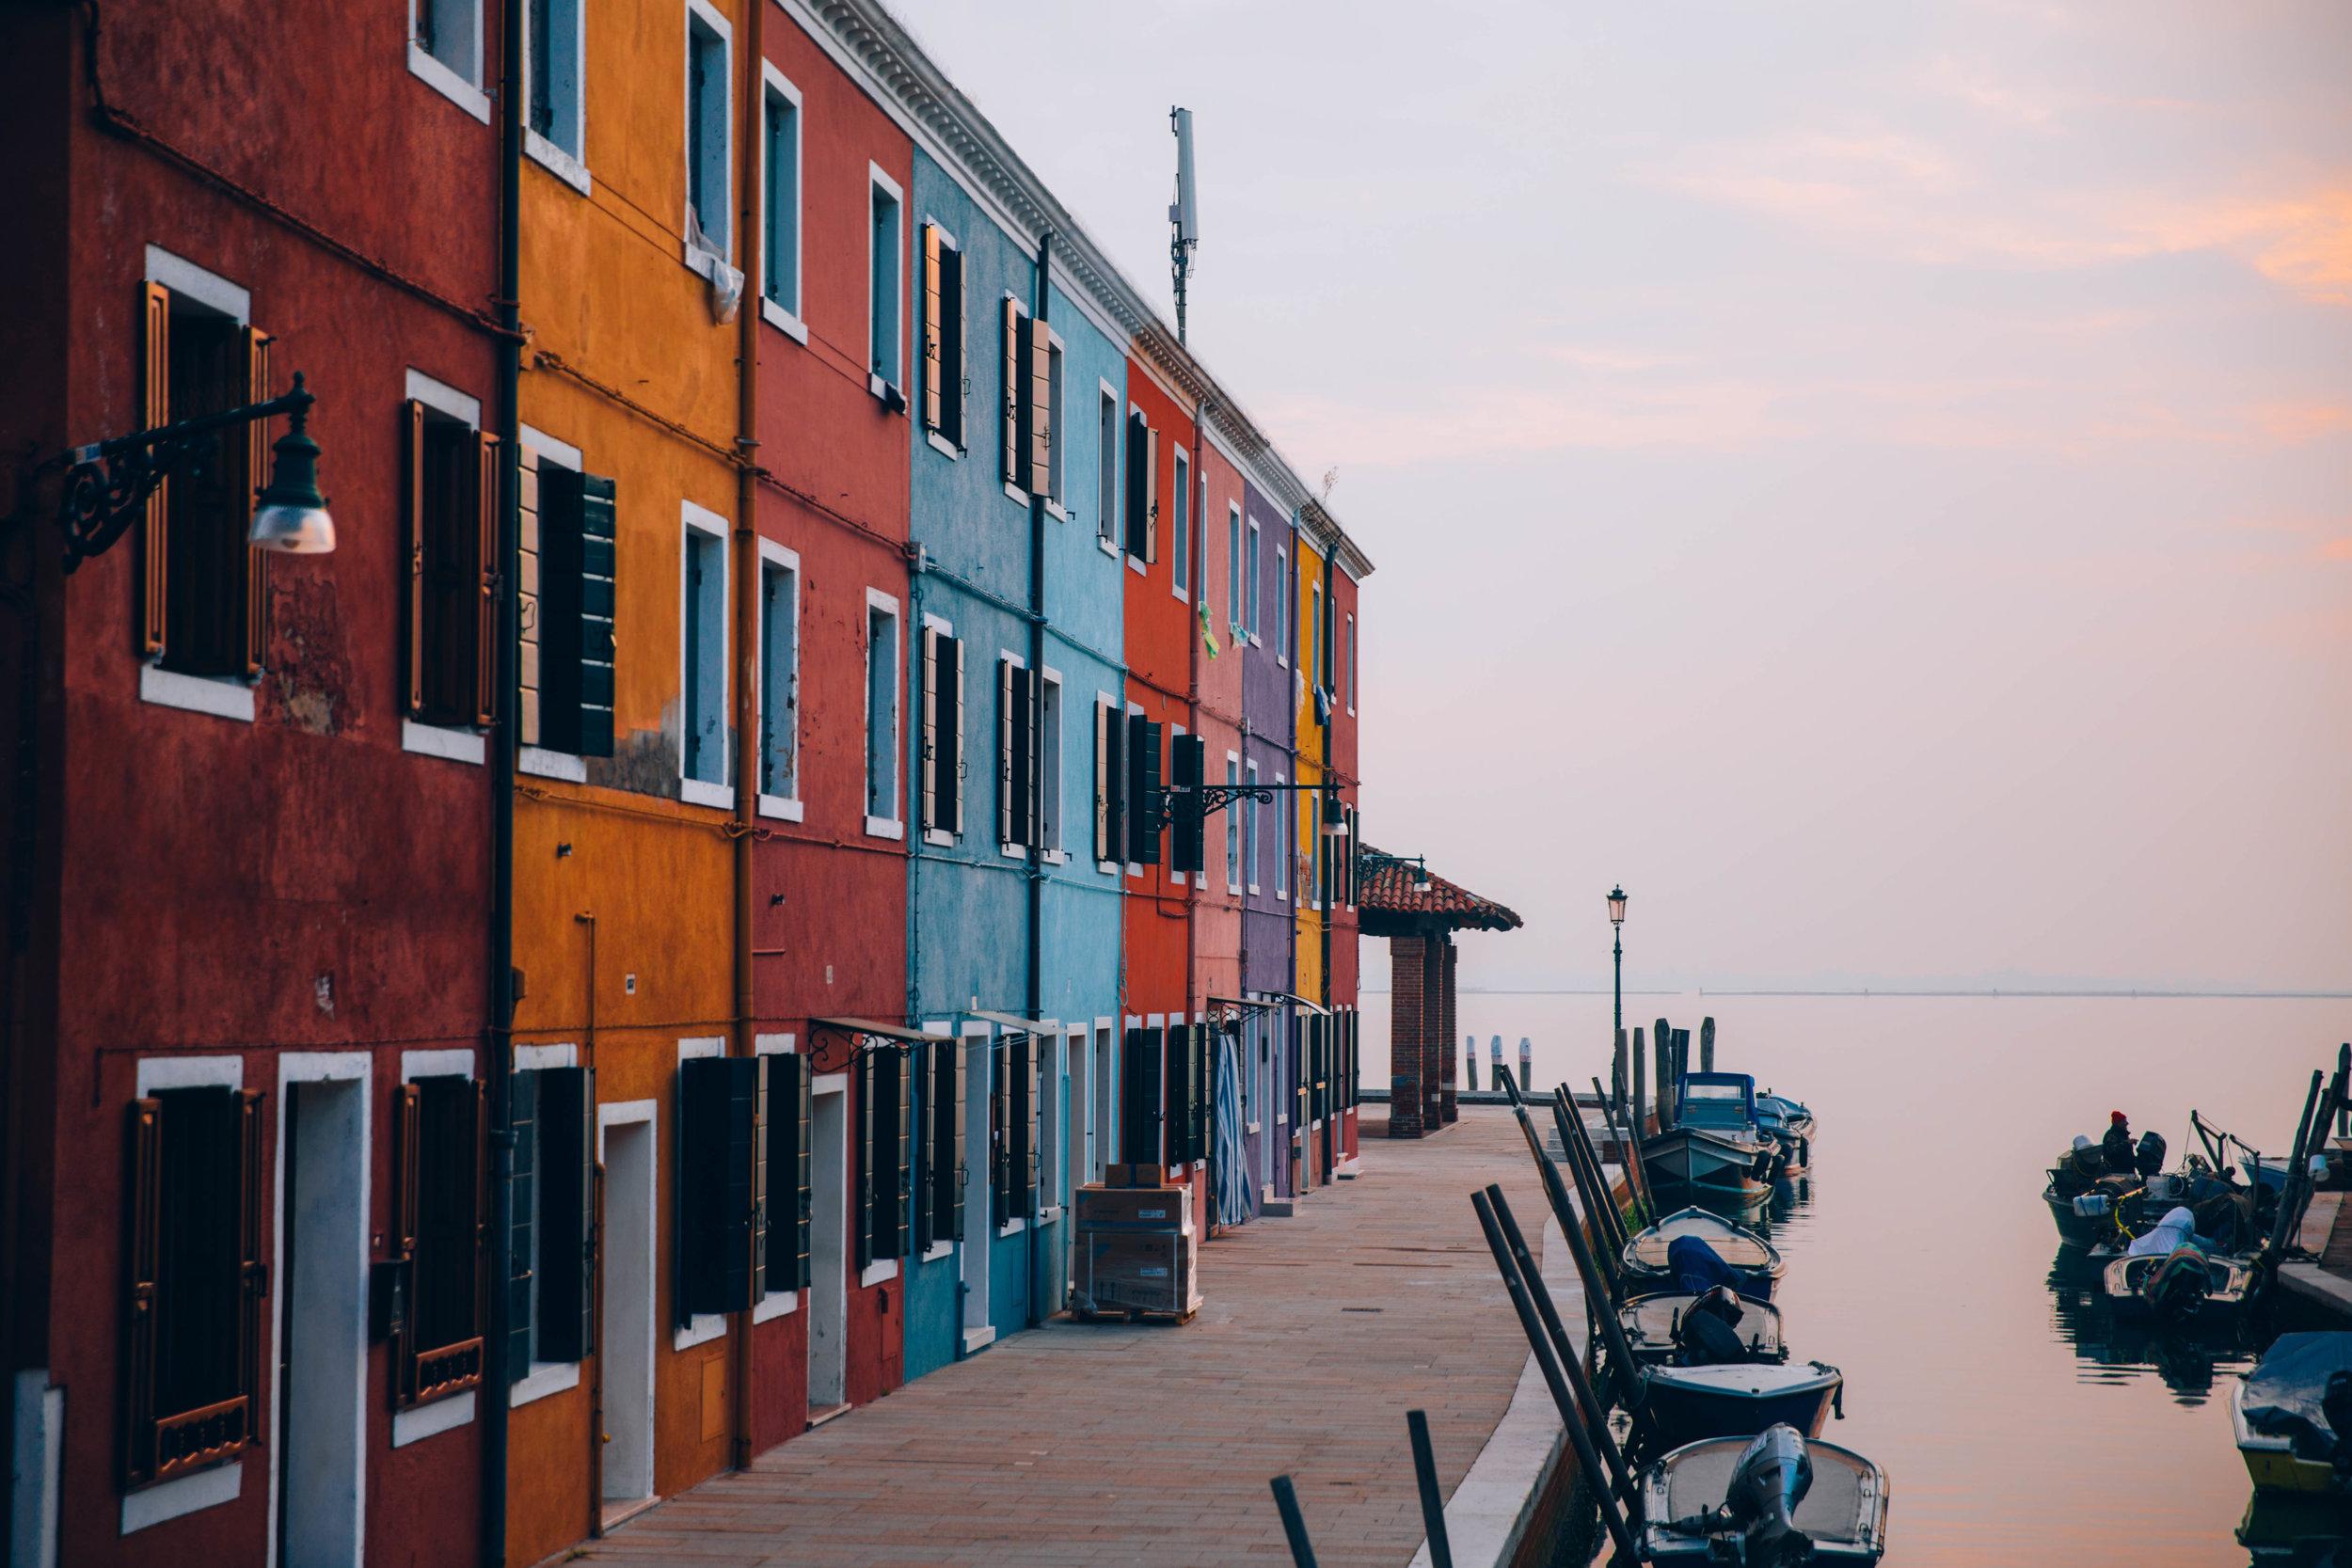 Venice-259.jpg